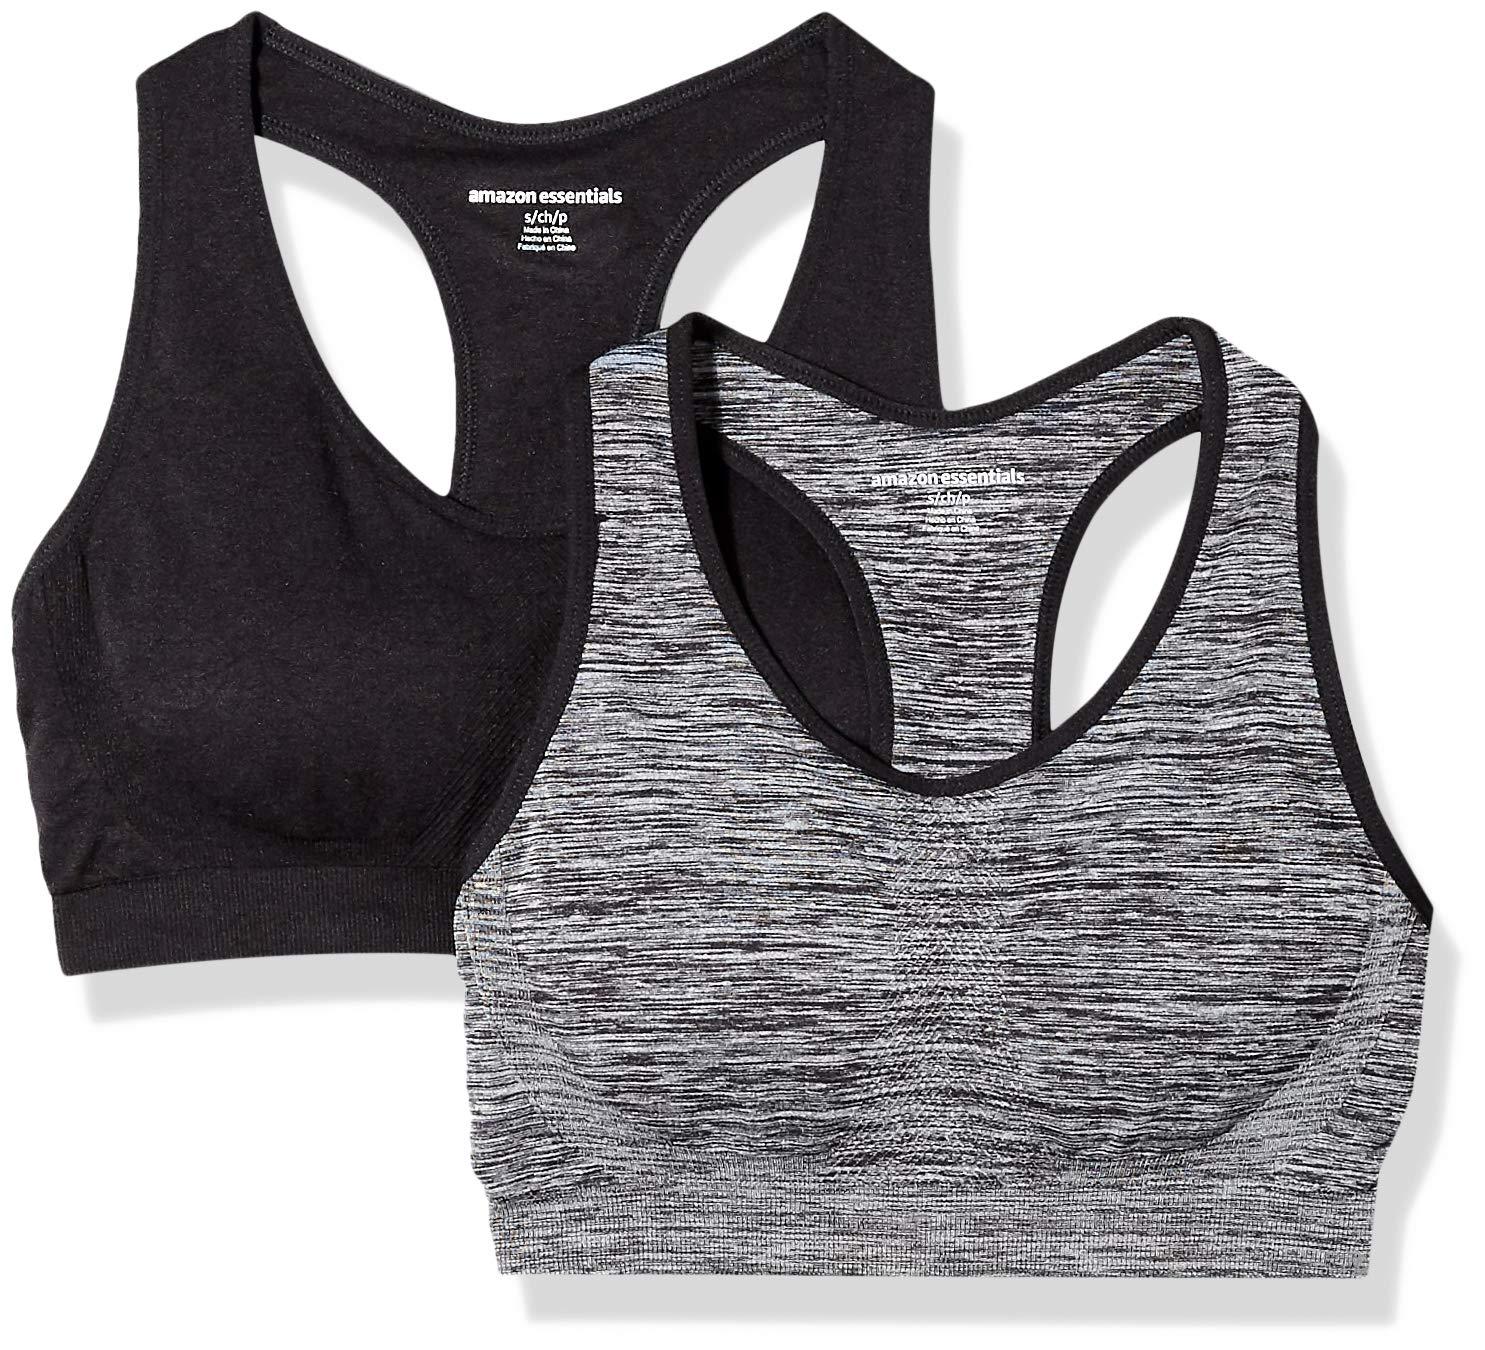 Amazon Essentials Women's 2-Pack Light Support Seamless Sports Bras, Space dye/Black